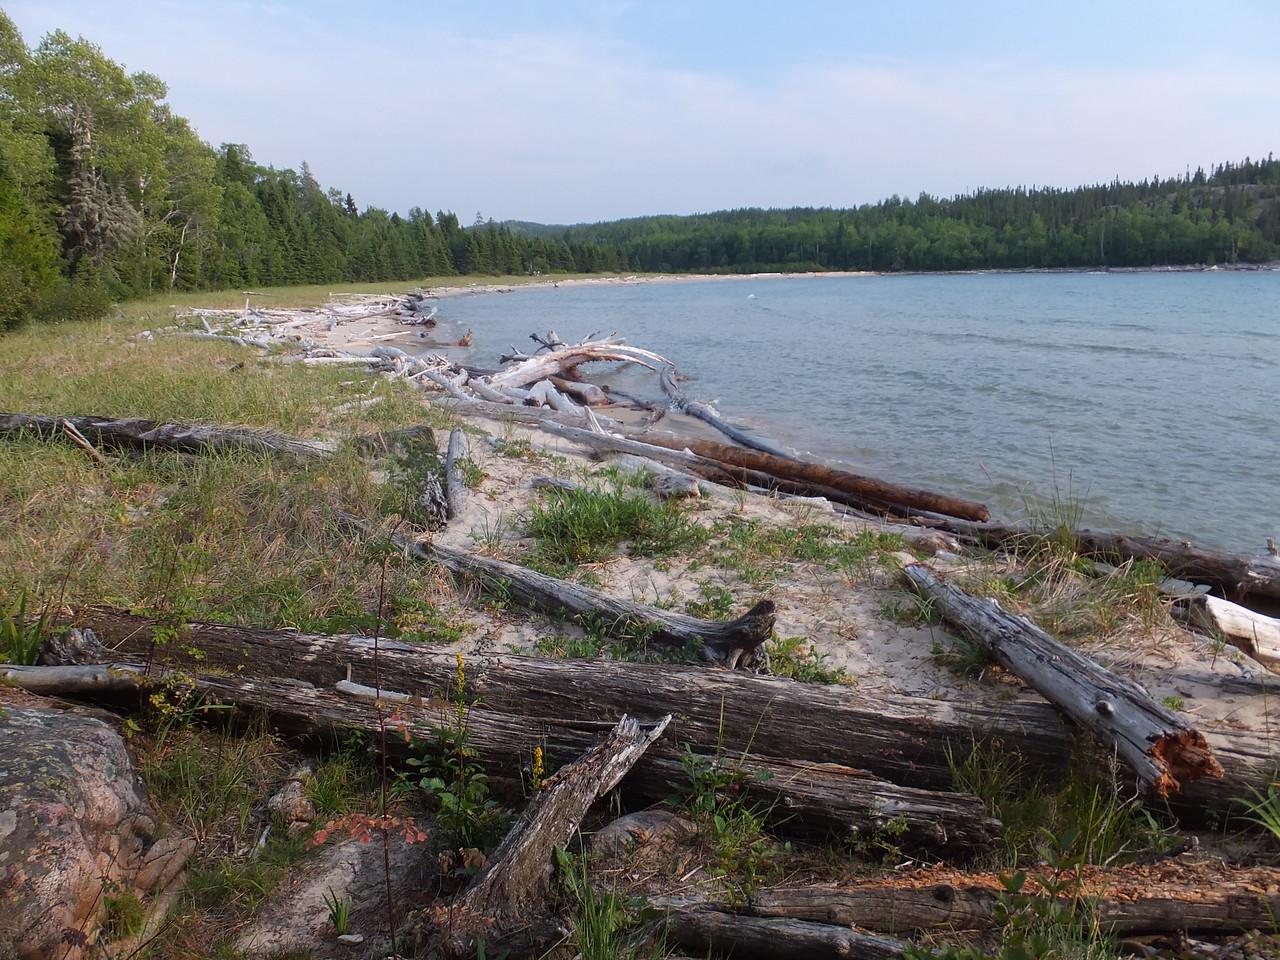 Willow River beach